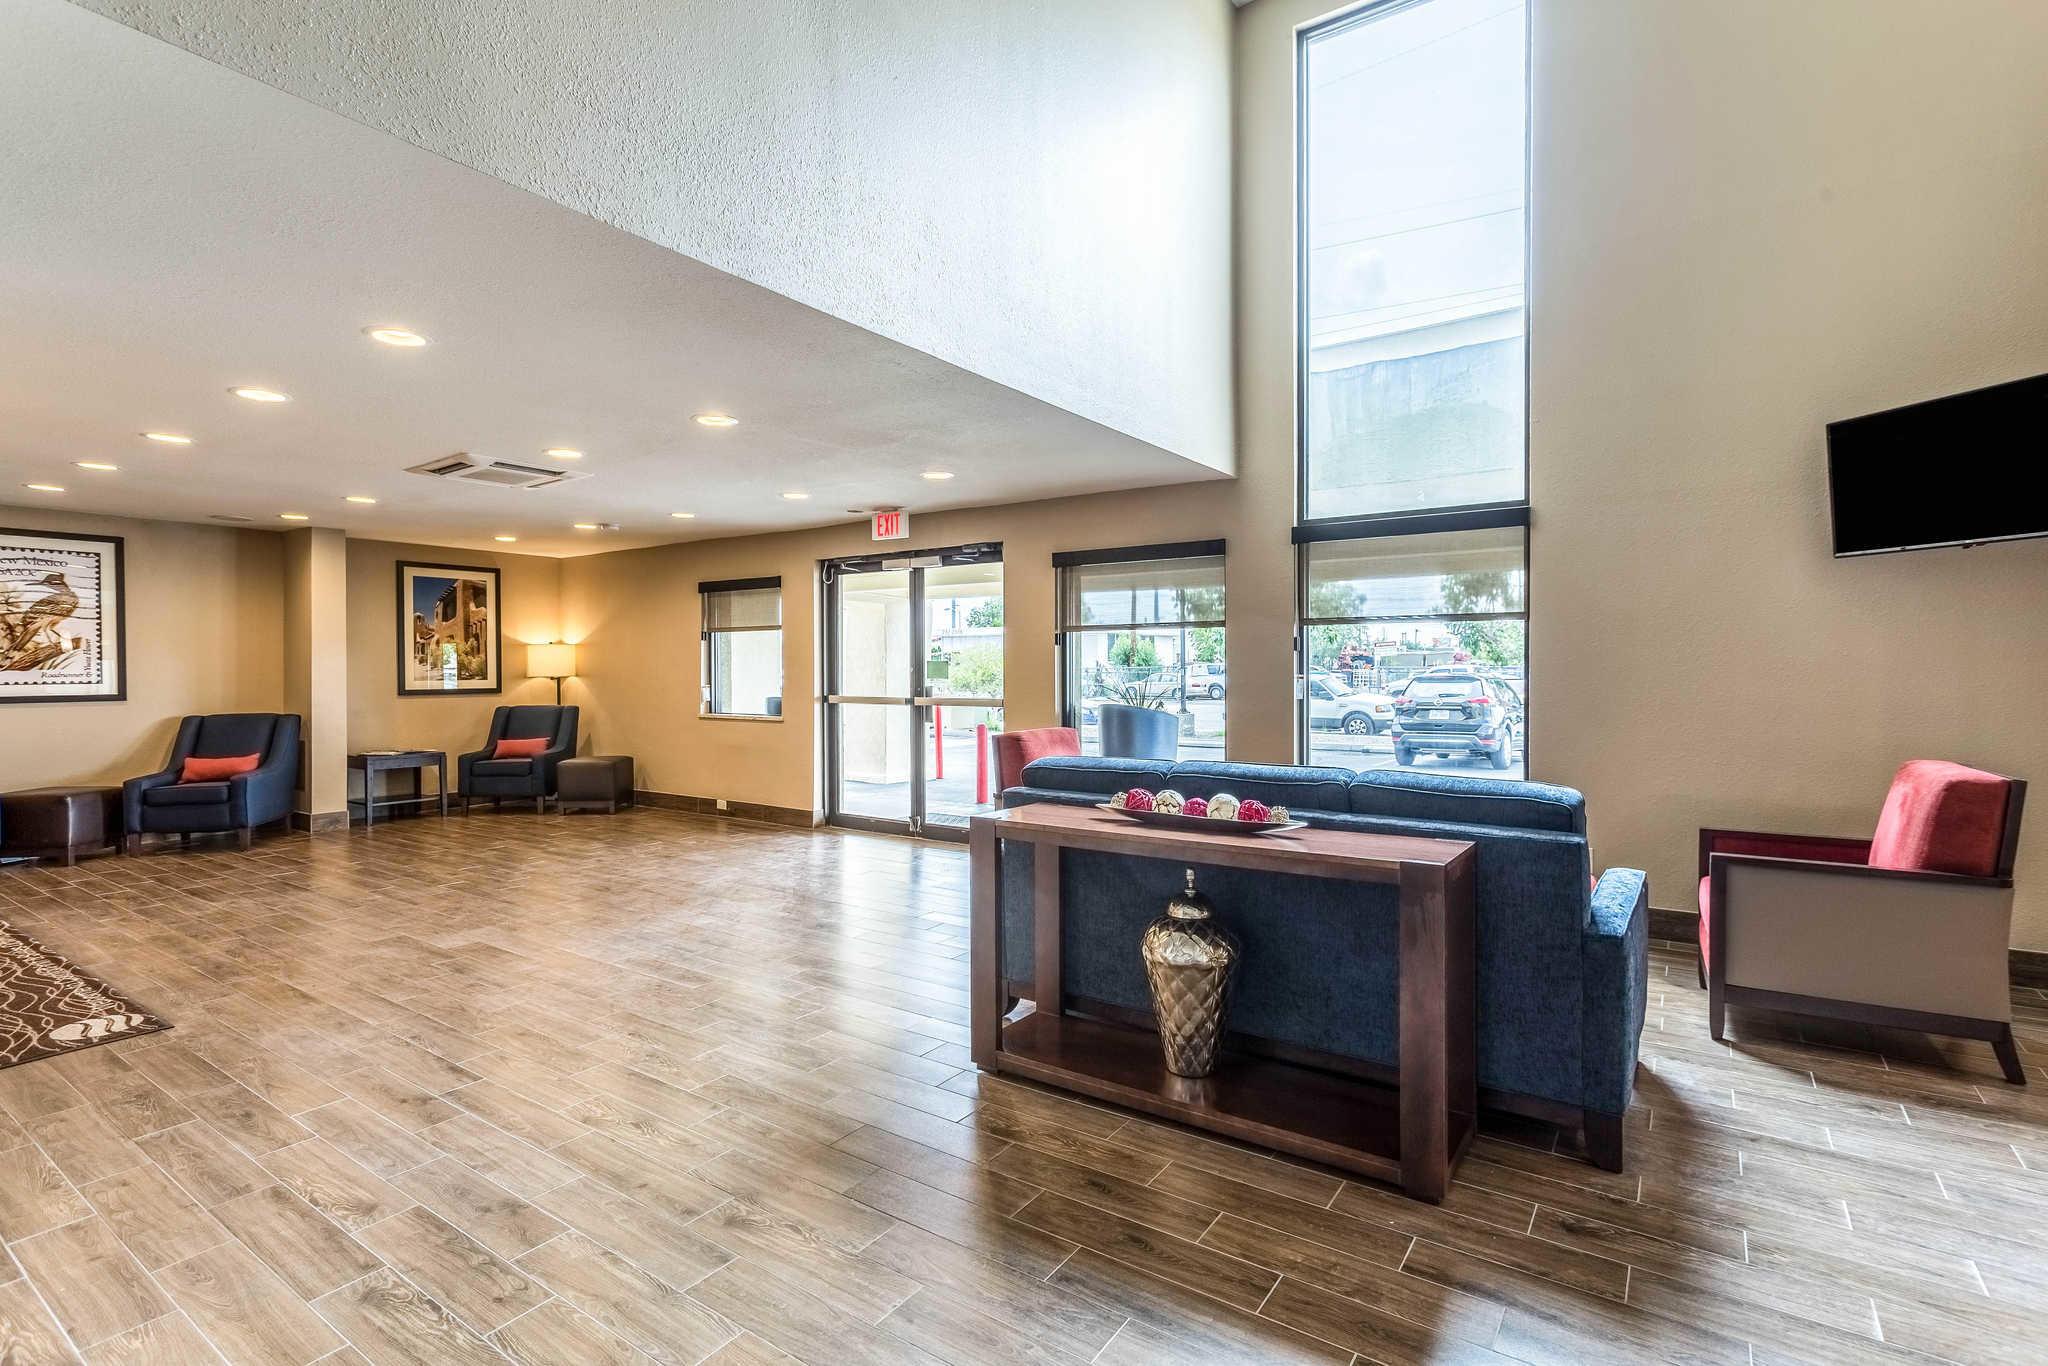 Comfort Inn & Suites Albuquerque Downtown image 6